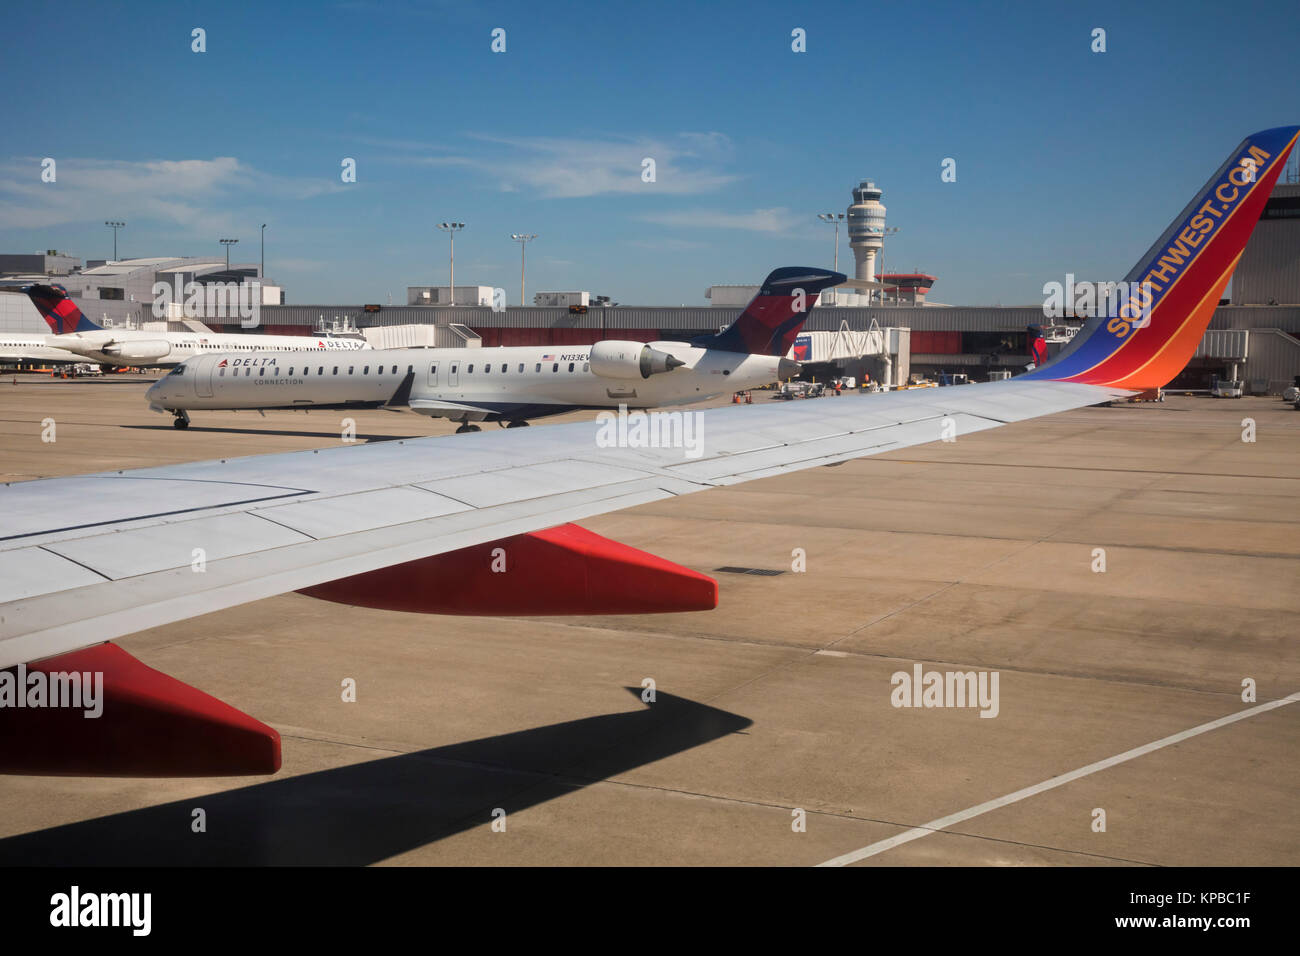 Atlanta, Georgia - Southwest and Delta jets on the tarmac at Hartsfield–Jackson Atlanta International Airport. - Stock Image